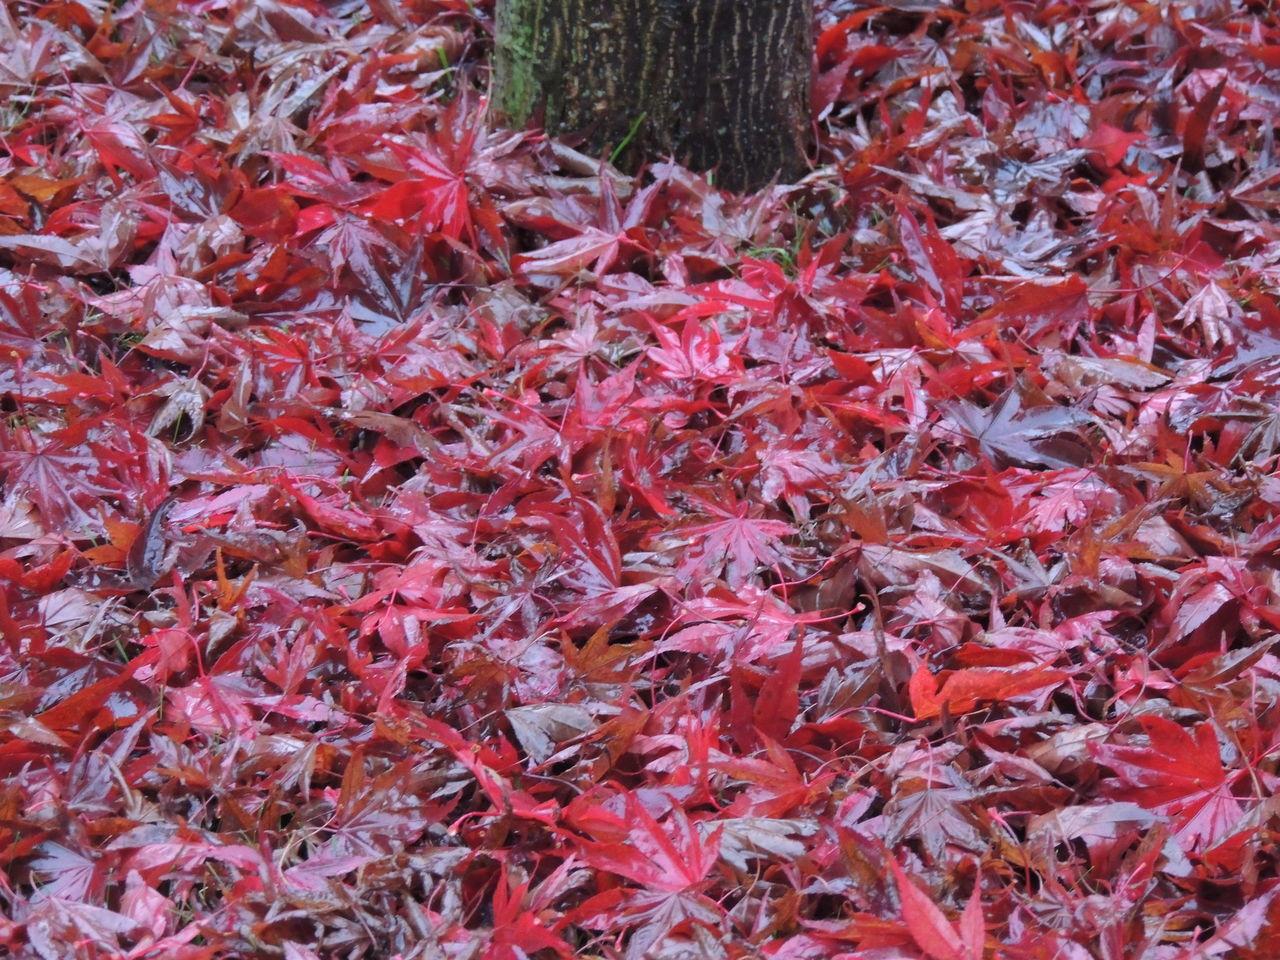 Autumn Autumn 2016 Autumn Collection Autumn Colors Autumn Colours Autumn Leafs Autumn Trees Autumnbeauty Autumncolors Autumn🍁🍁🍁 Leaf Leaf Fantasy Leaf 🍂 Leafs Leafs Colors Leafs Colours Leafs Photography Leafs 🍃 Leafs. Leafscape Leafseason Tree Trees Trees Collection Treescollection